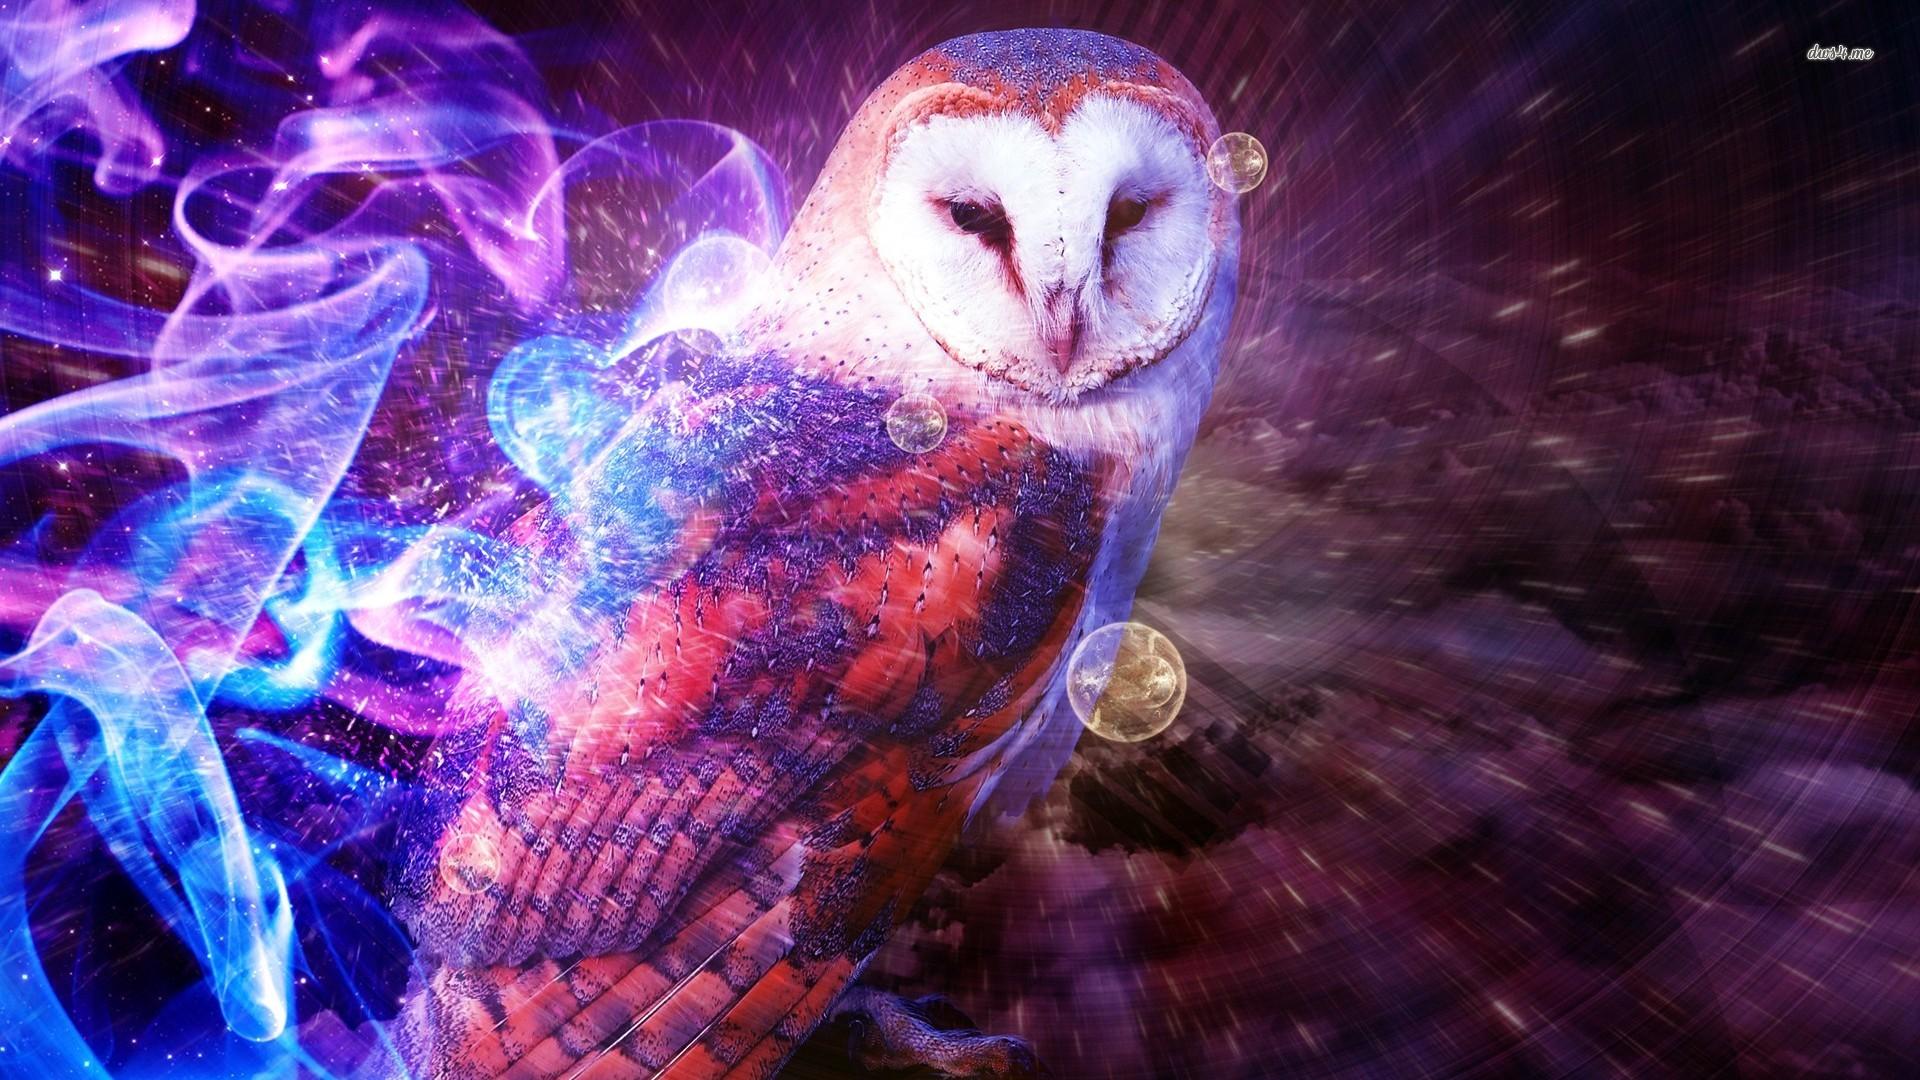 Owl wallpaper   Digital Art wallpapers   8713 1920x1080